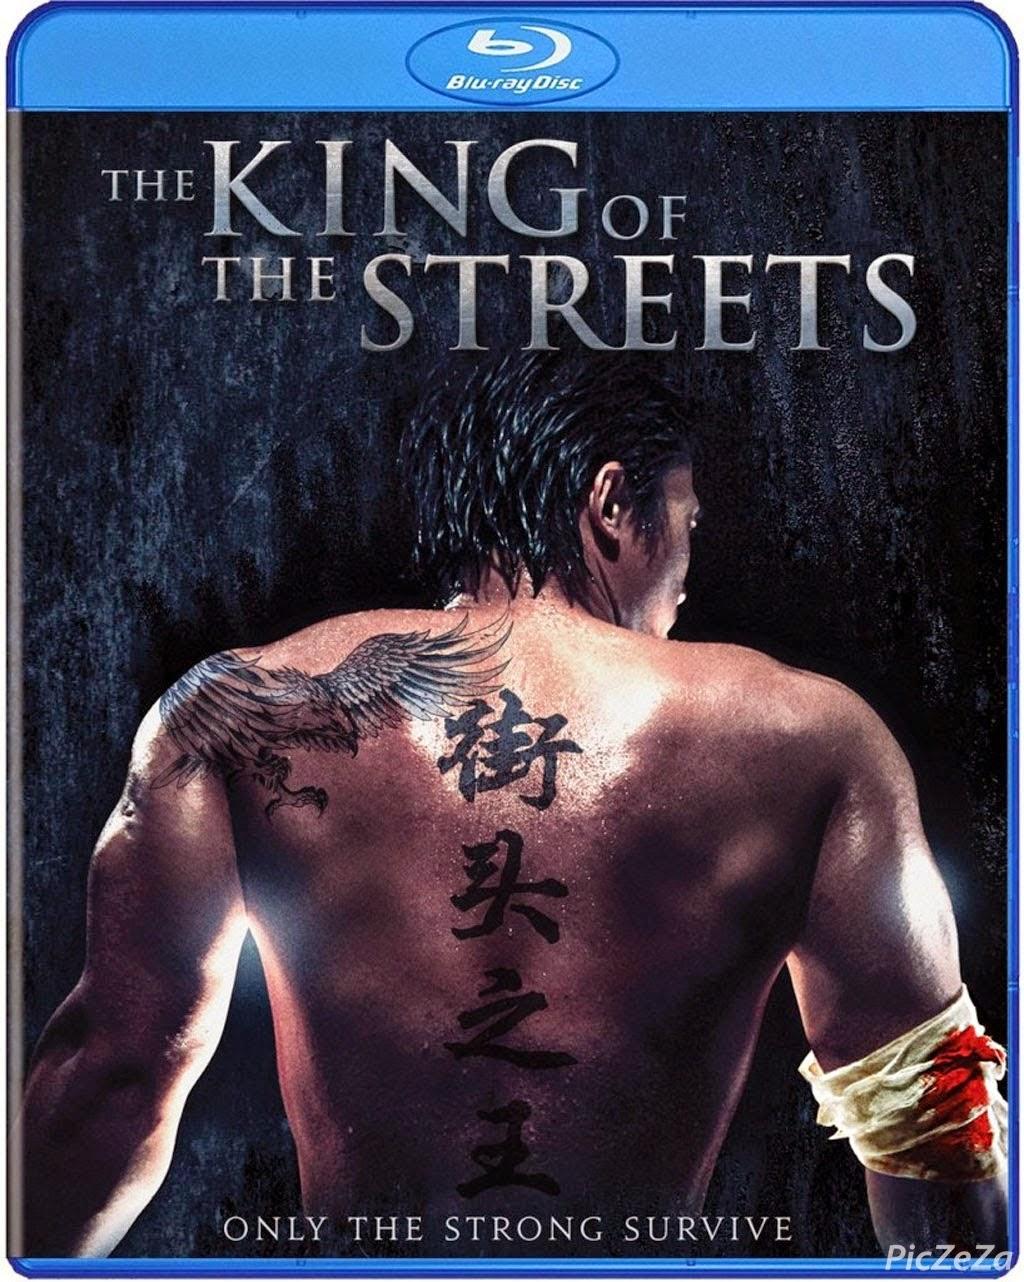 The King of The Streets ซัดไม่เลือกหน้า ฆ่าไม่เลือกพวก